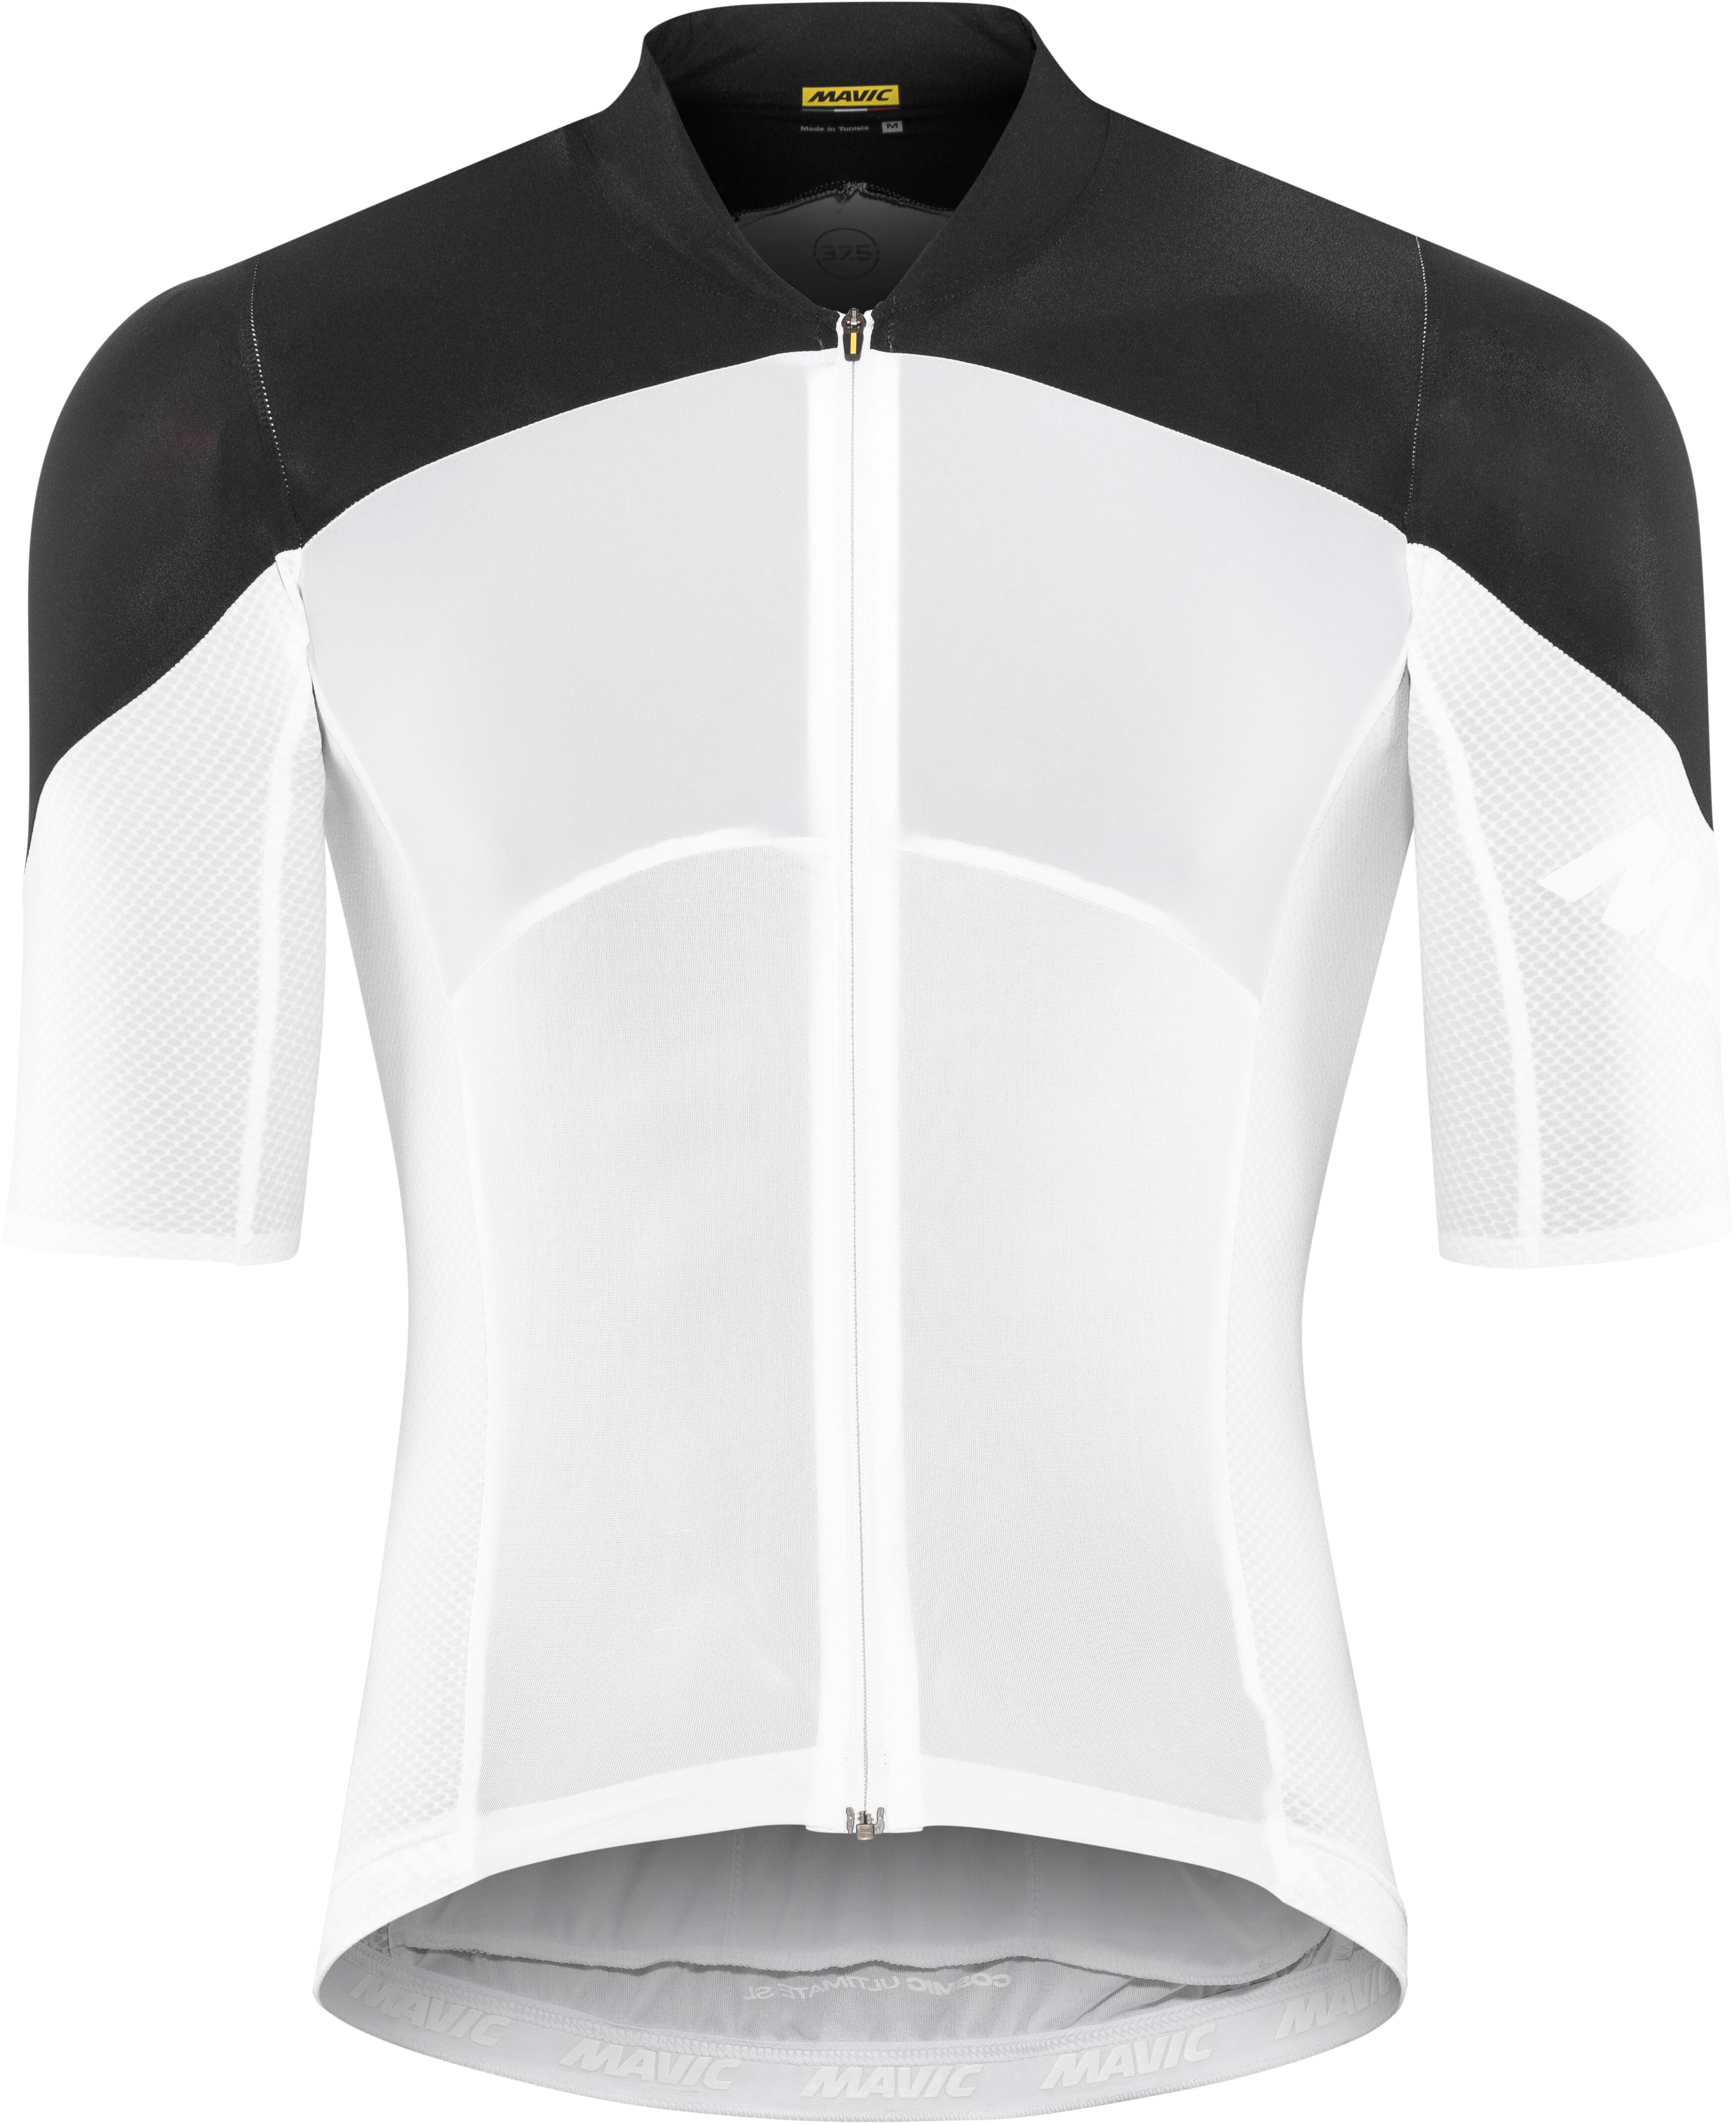 fcf5593b4 Mavic Cosmic Ultimate Bike Jersey Shortsleeve Men white black at ...